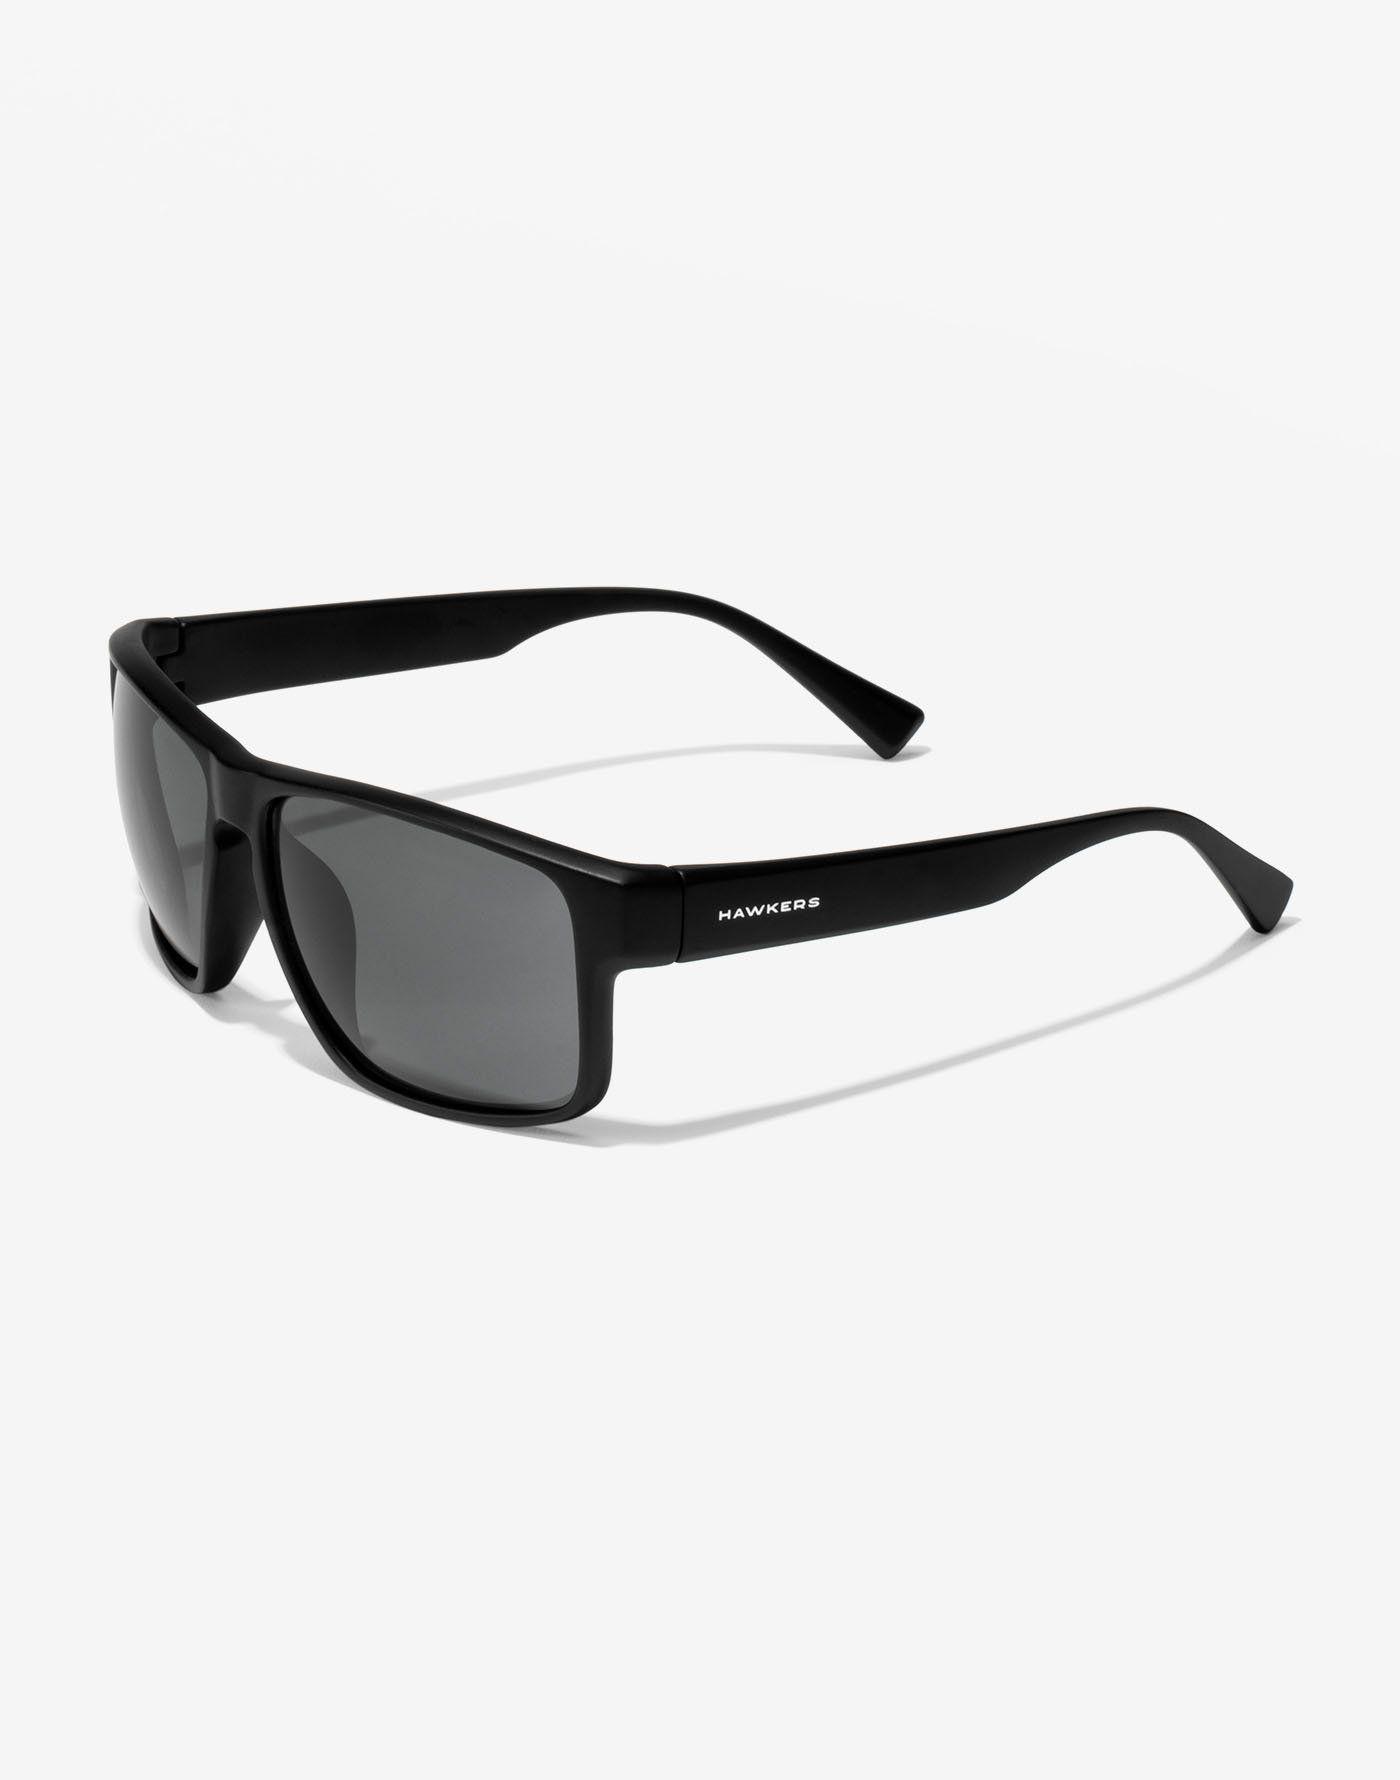 Mens Classic Black Rectangular Sports Army Style Polarised Cat3 Sunglasses UV400